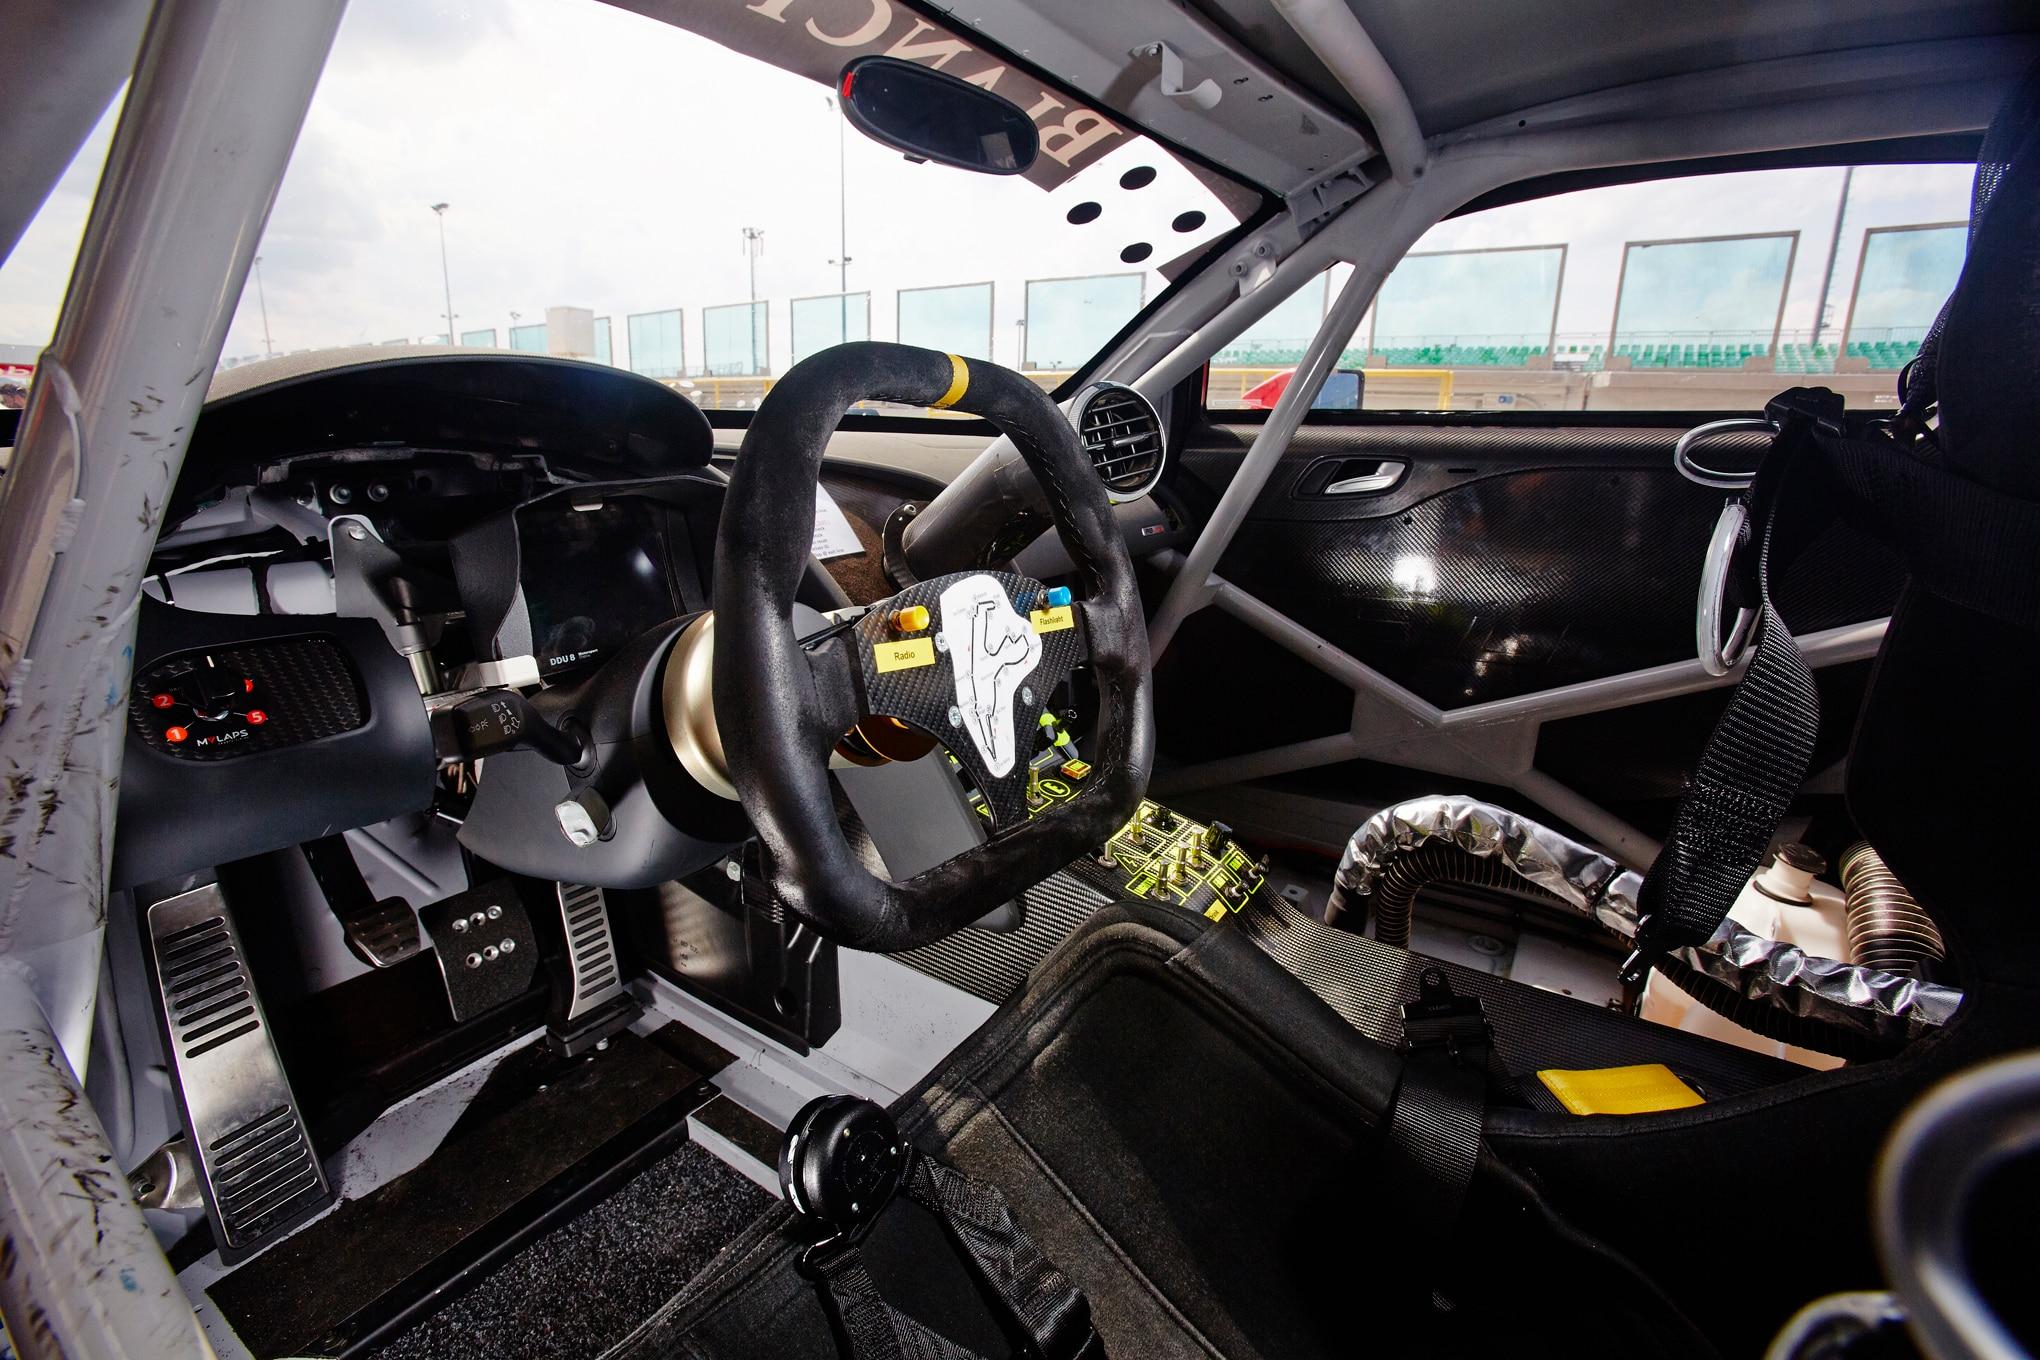 Audi Le Mans Program to End by 2018: Report | Automobile ...